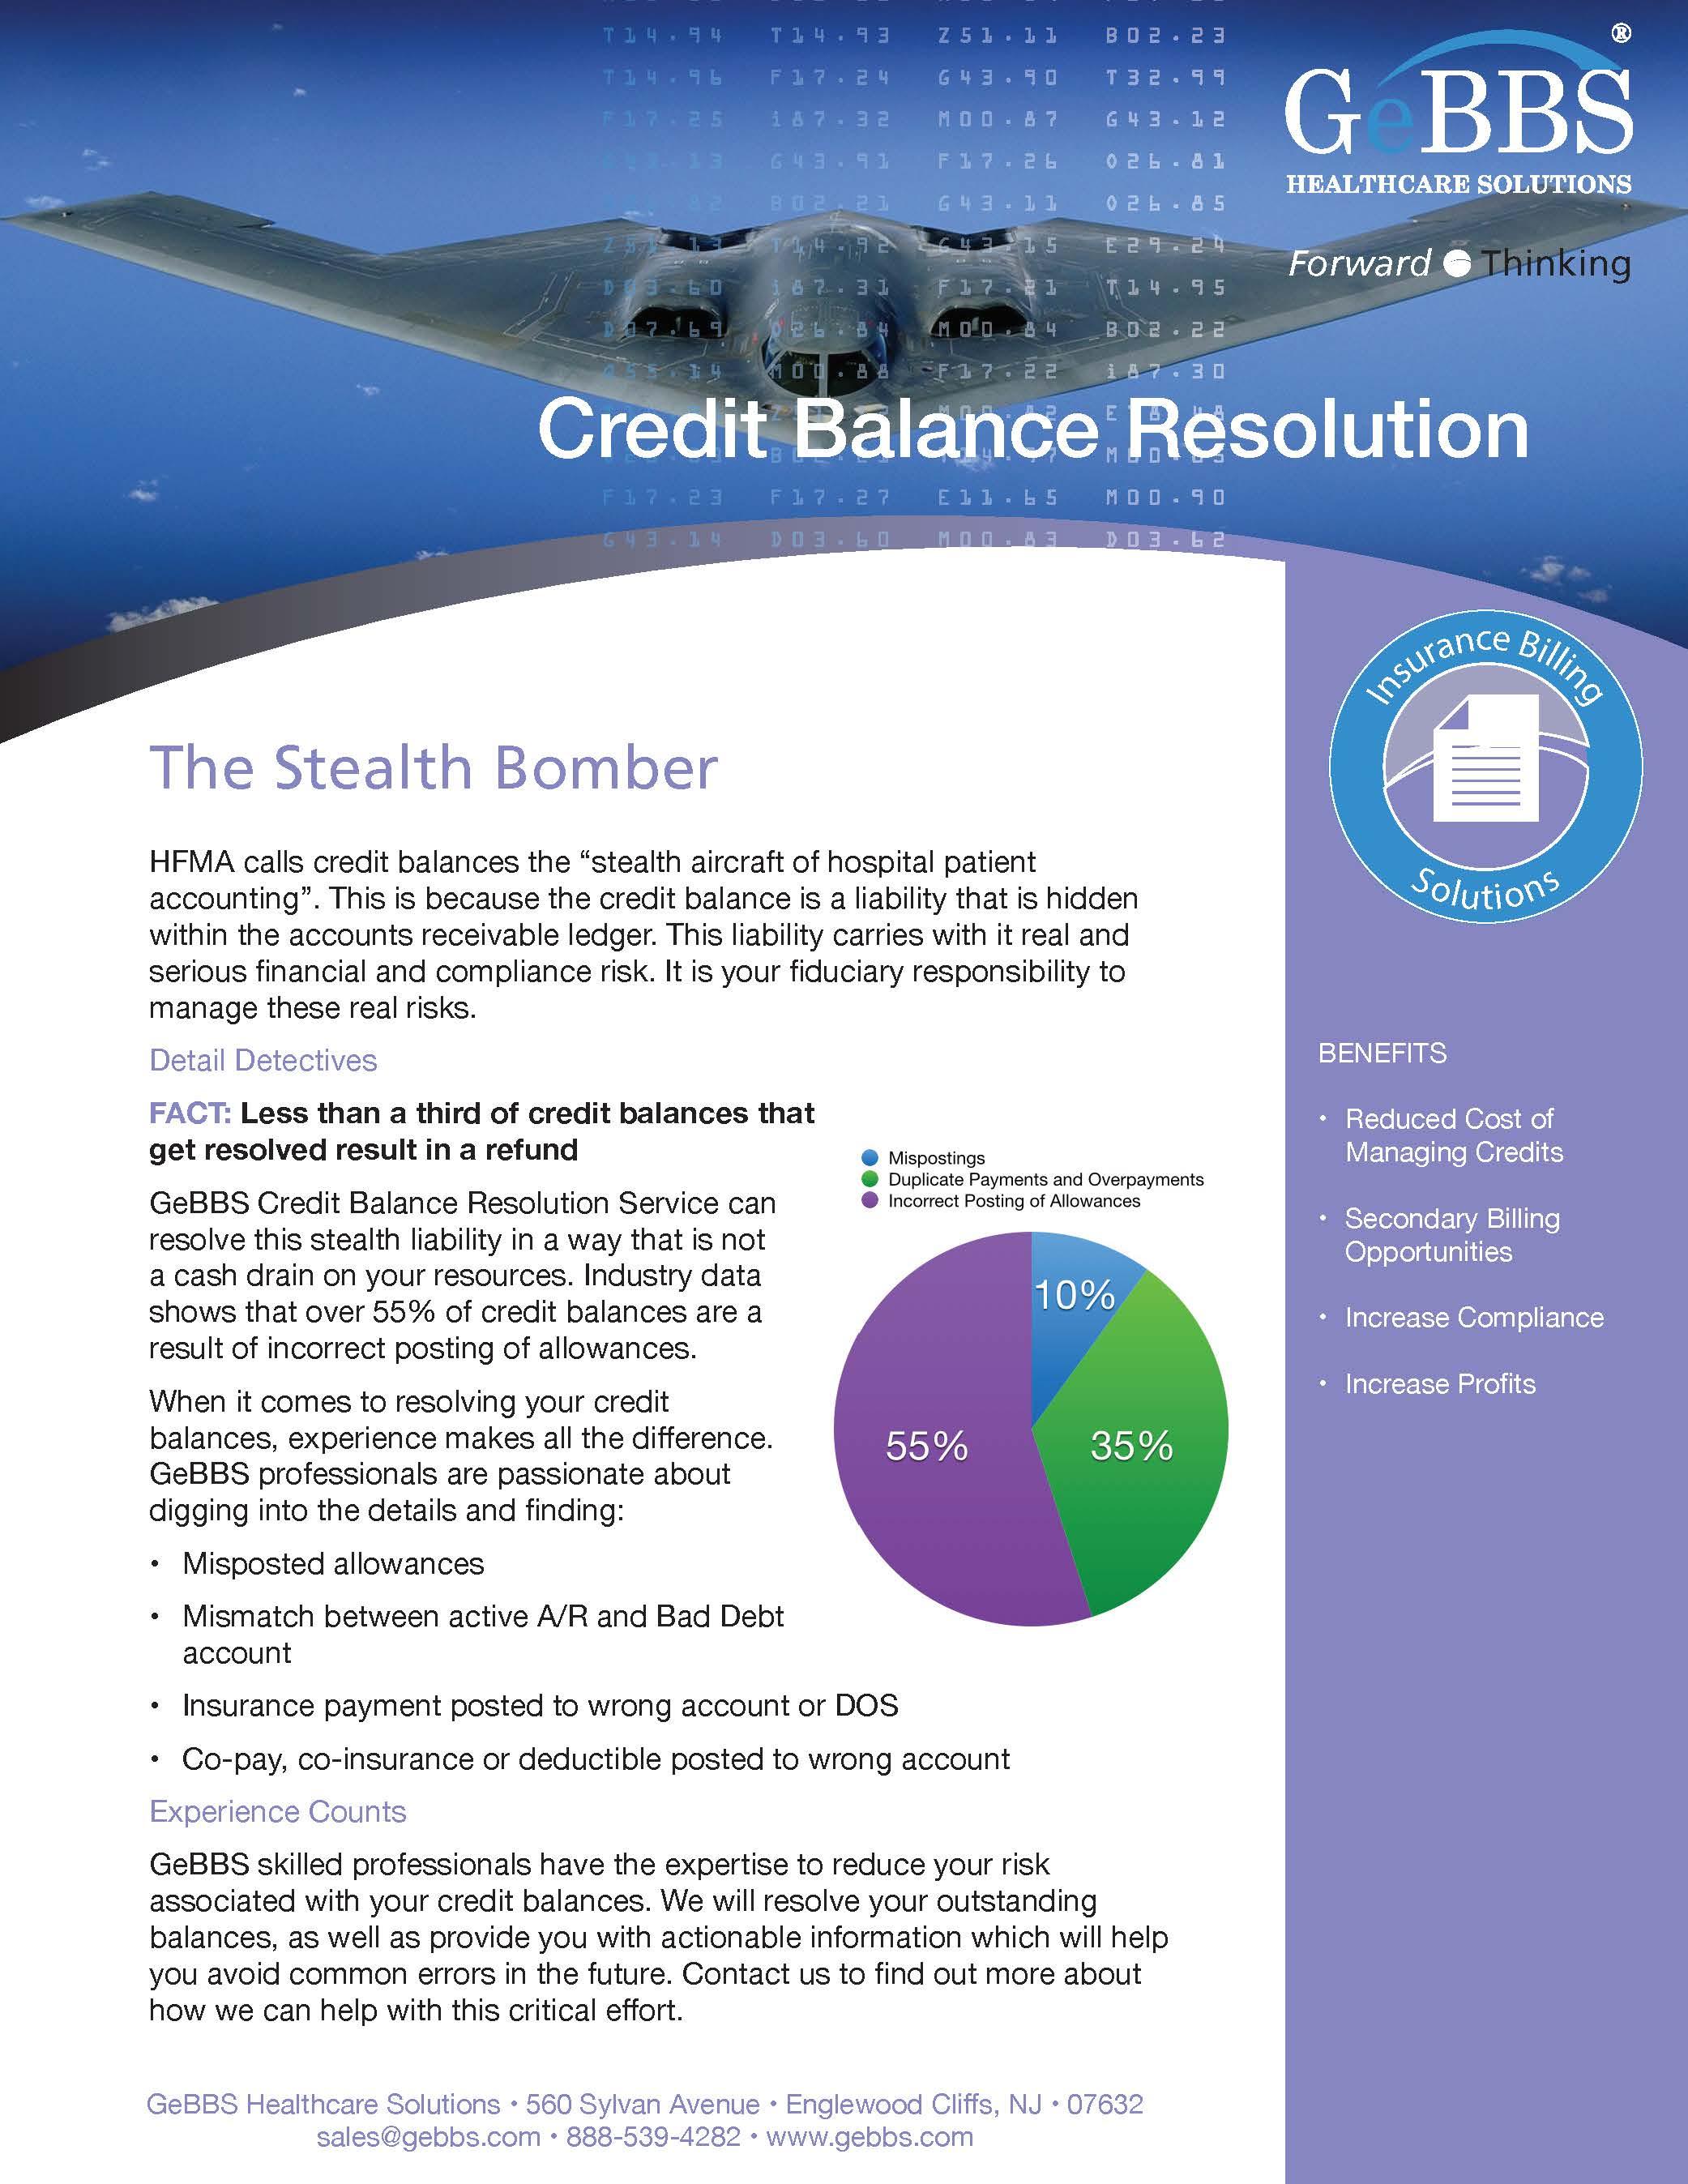 GeBBS Credit Balance Resolution Sell Sheet v2_Page_1.jpg